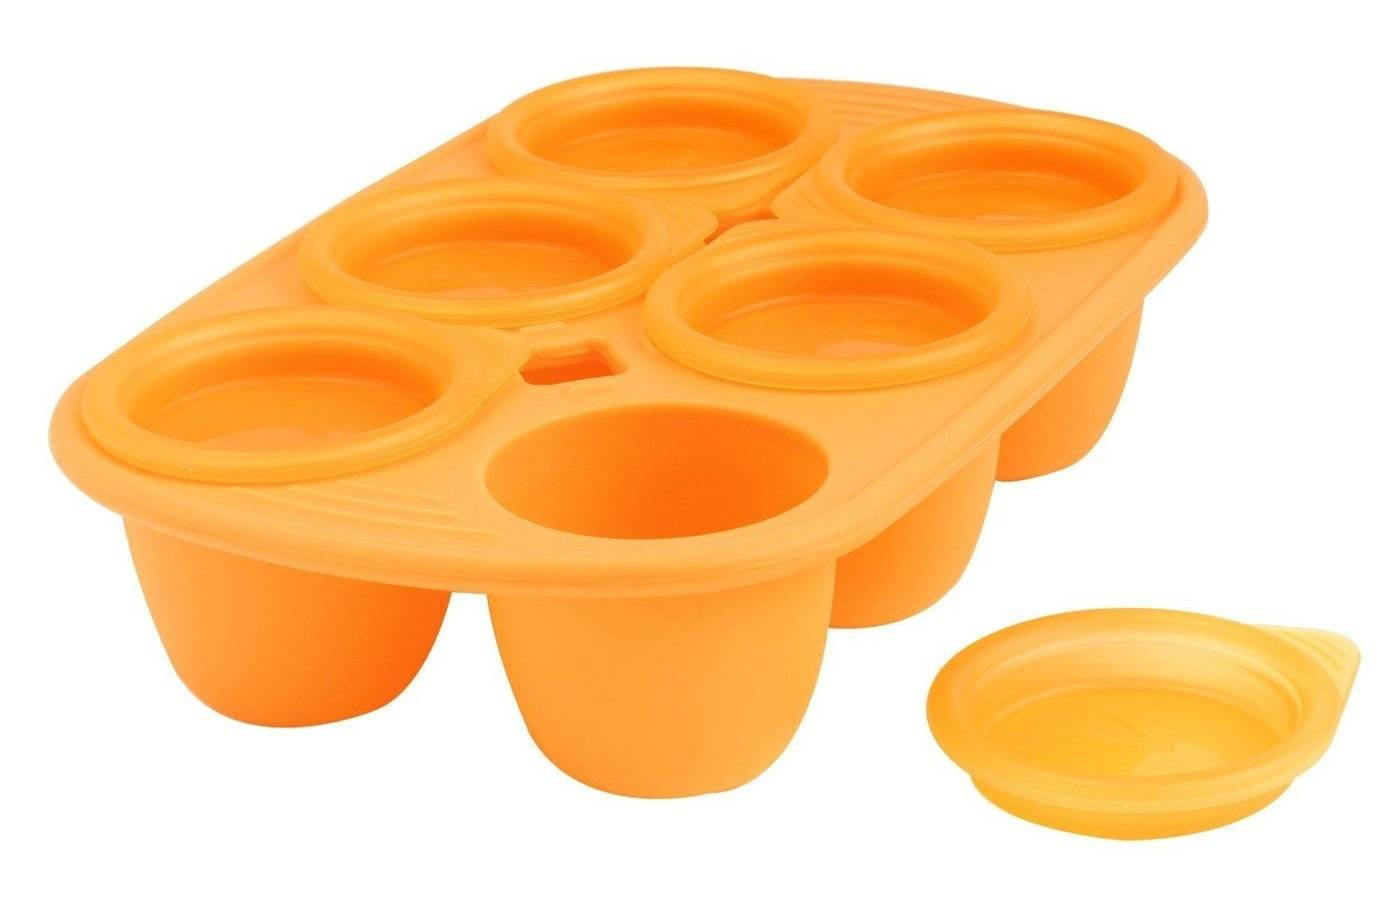 Silikonová miska Mastrad 6 porcí oranžová 60ml - Mastrad